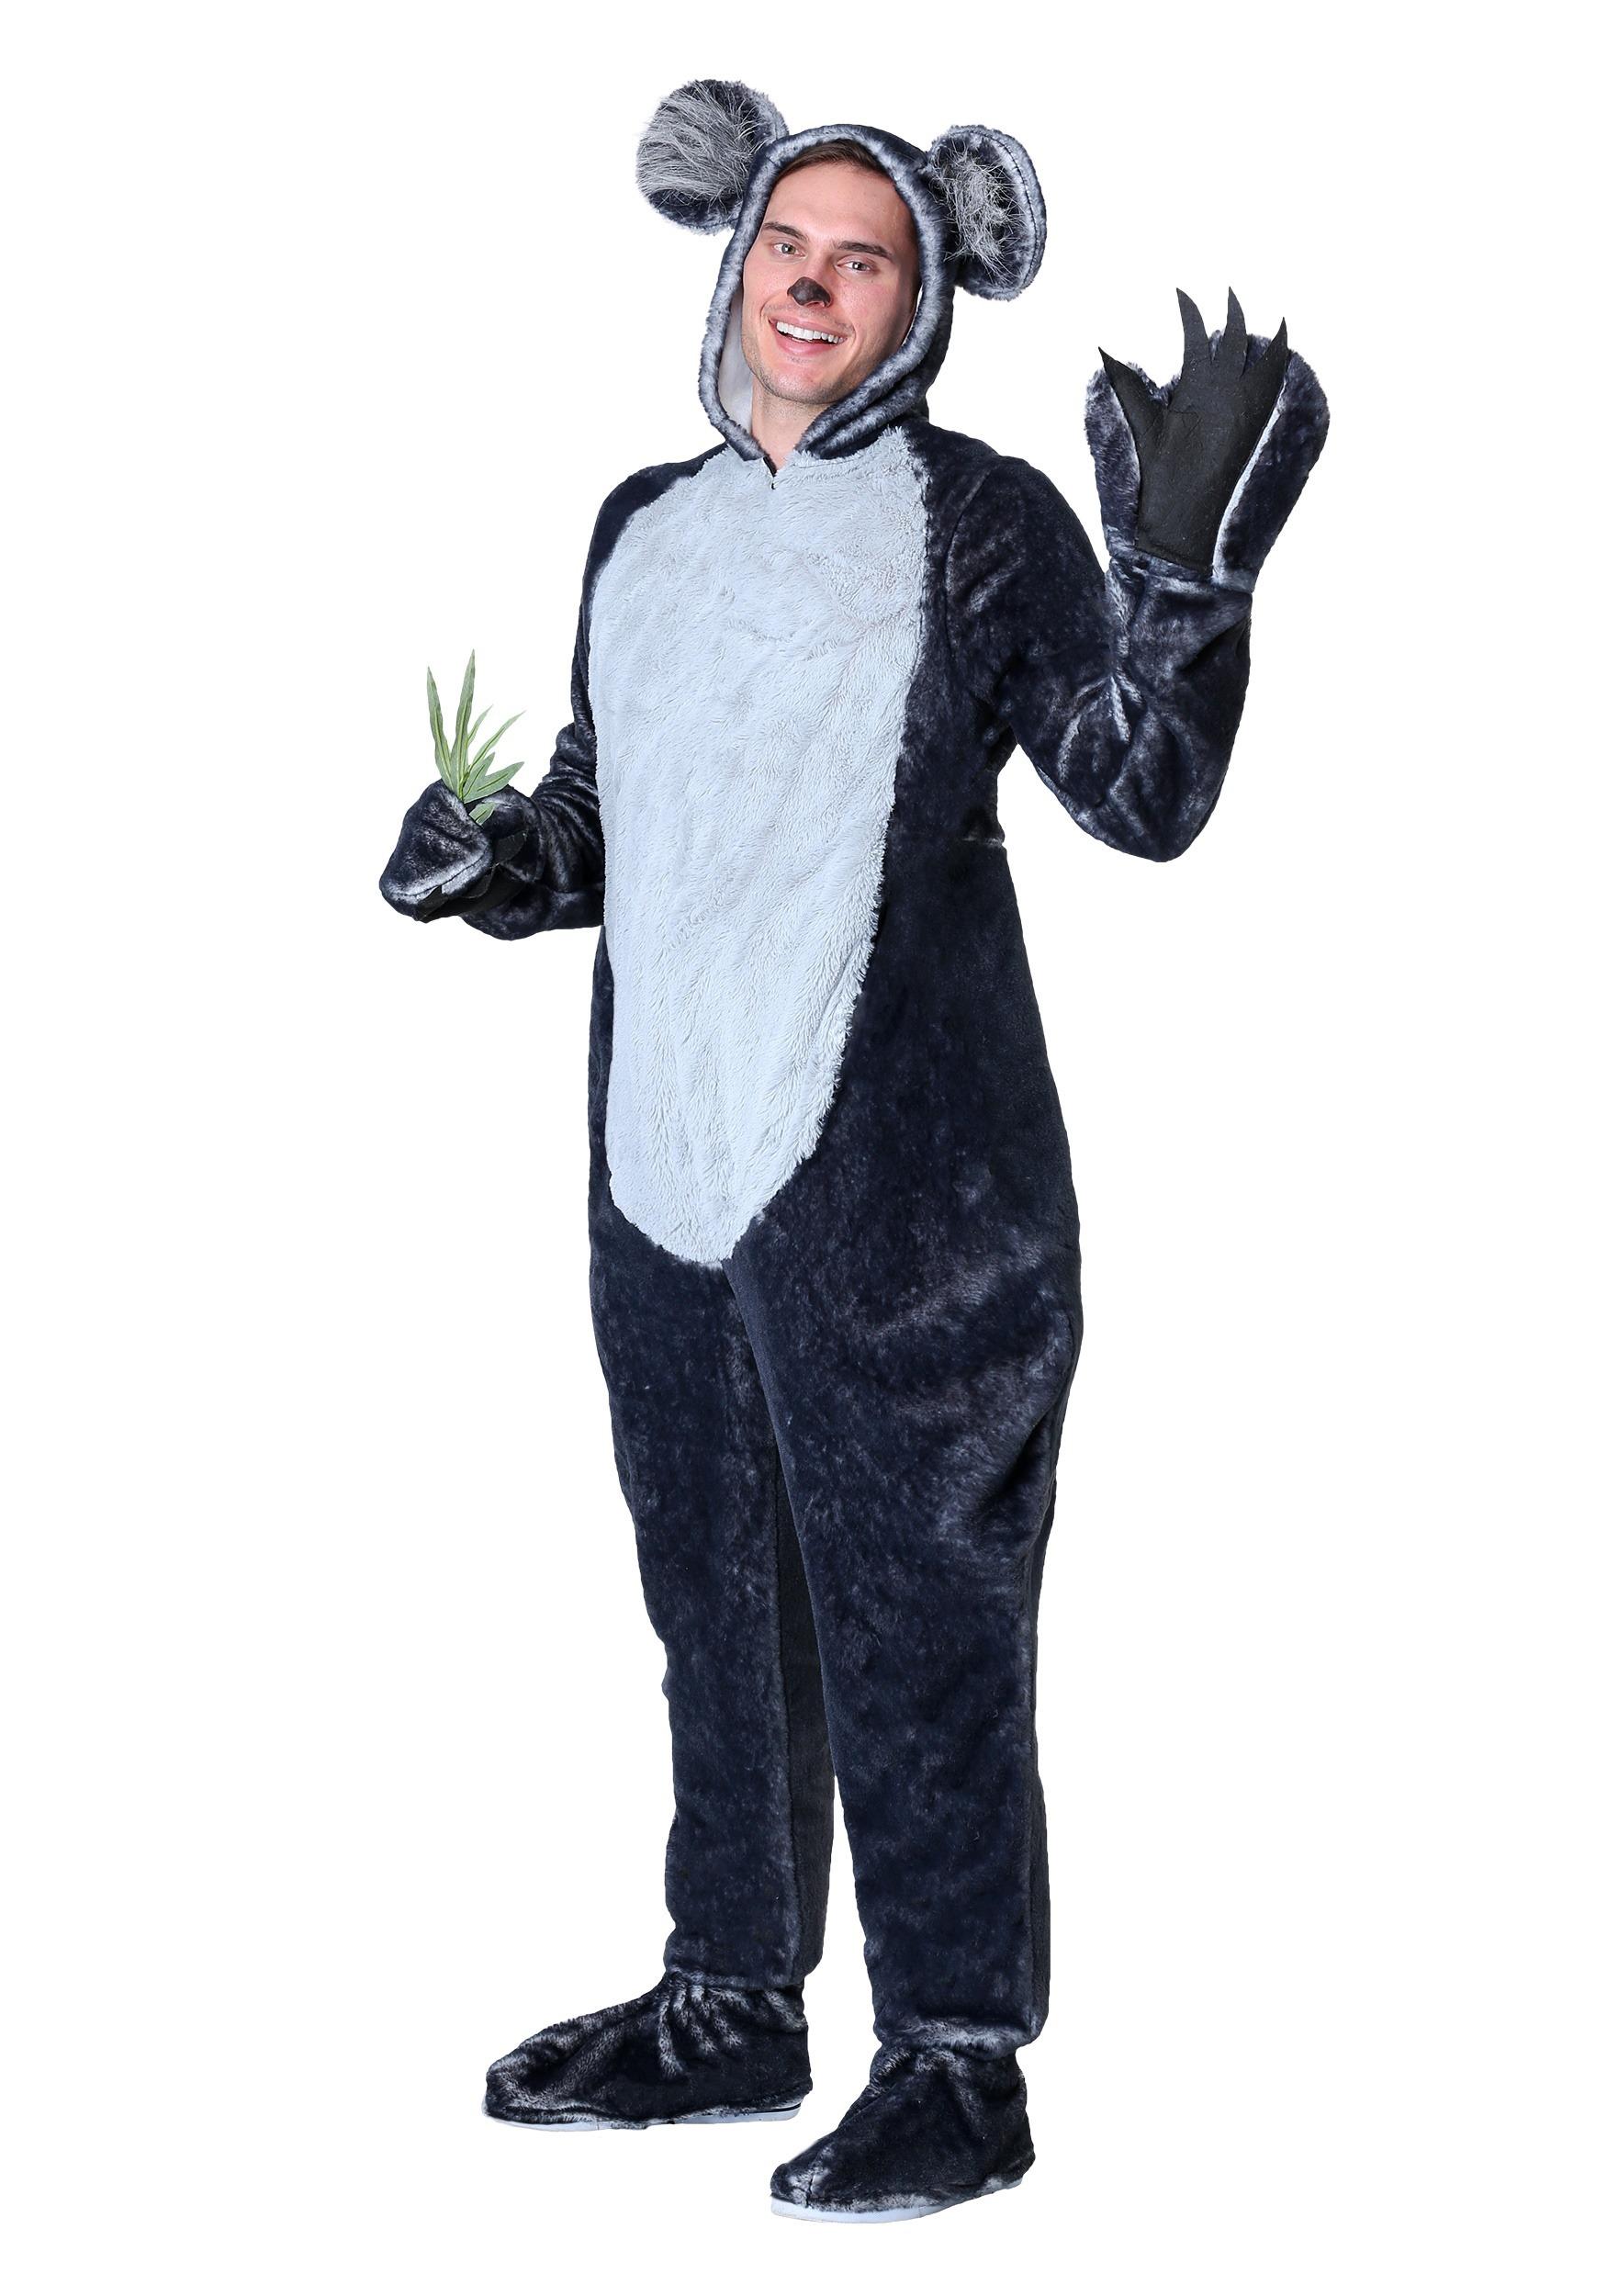 young-adult-koala-bear-costume-photos-and-candace